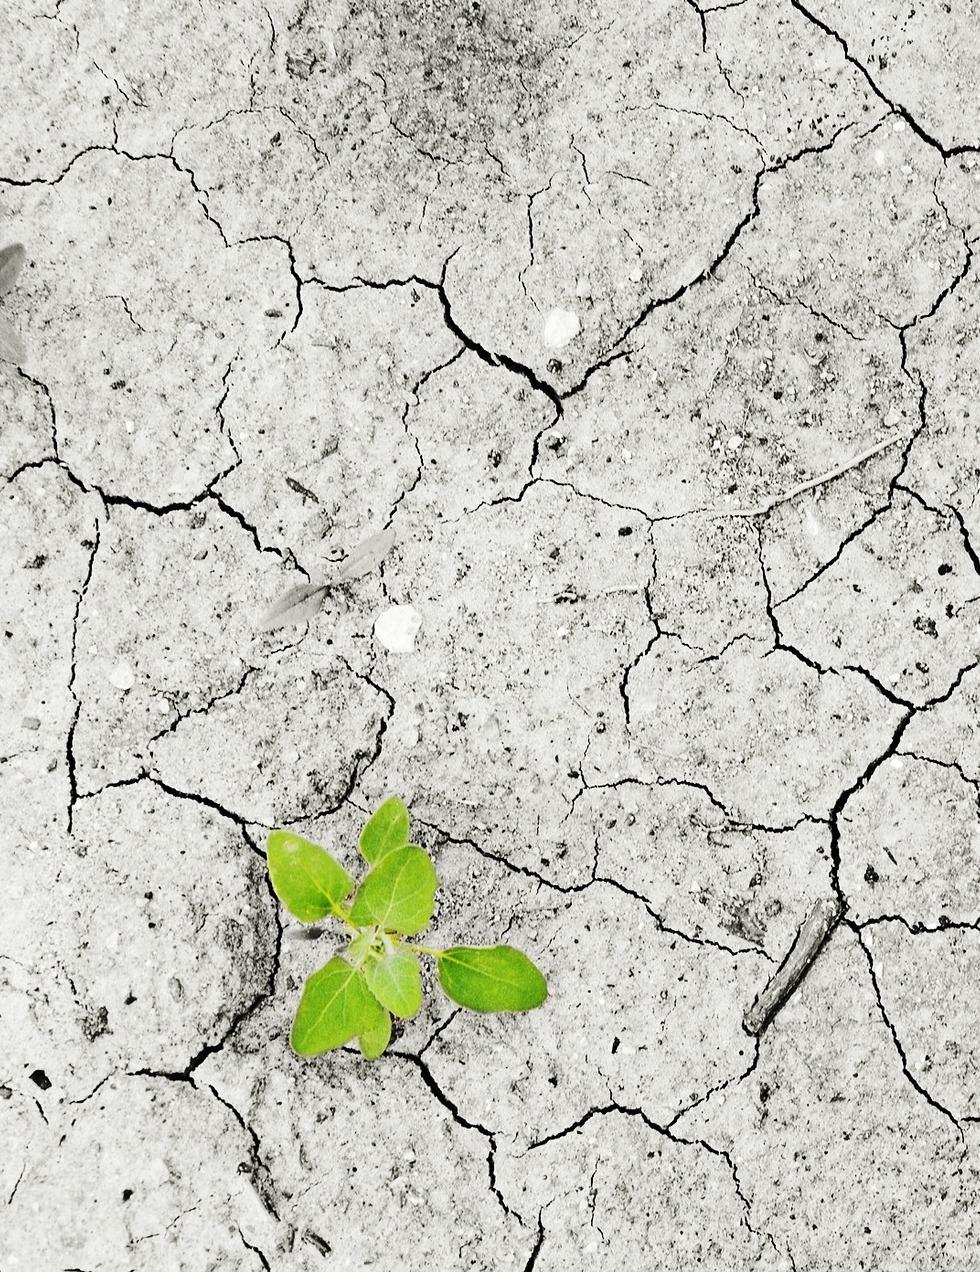 https://riftalliance.com/wp-content/uploads/2021/07/climate-change-3.jpg